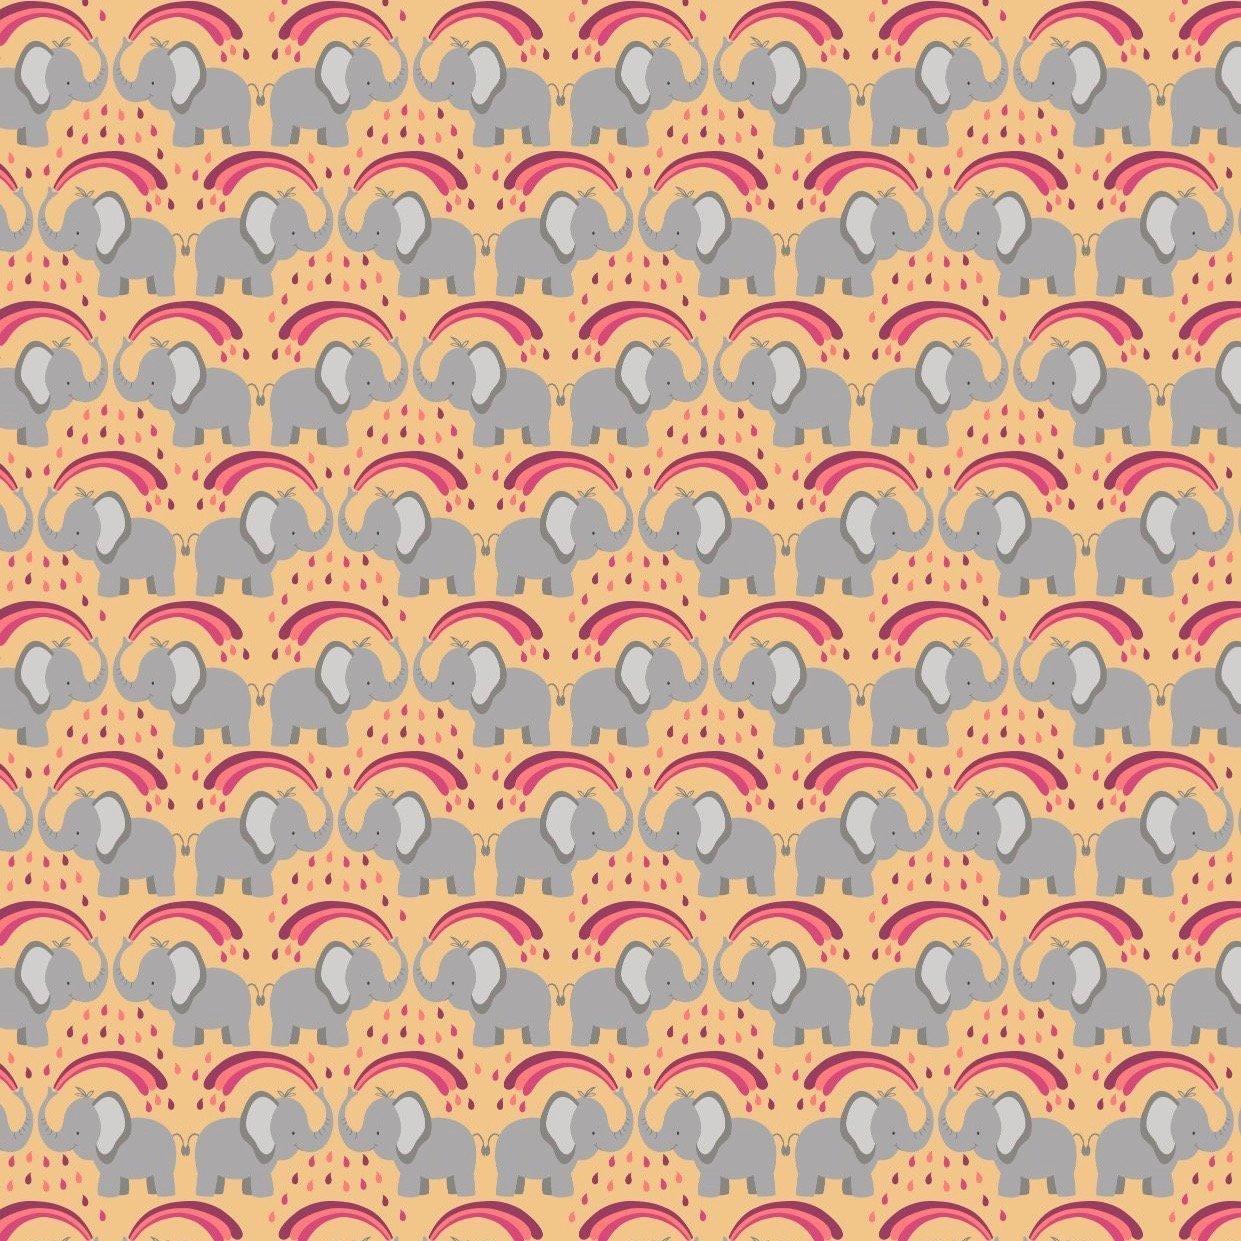 Lewis & Irene Rainbows - Rainbow Elephants (Ochre)